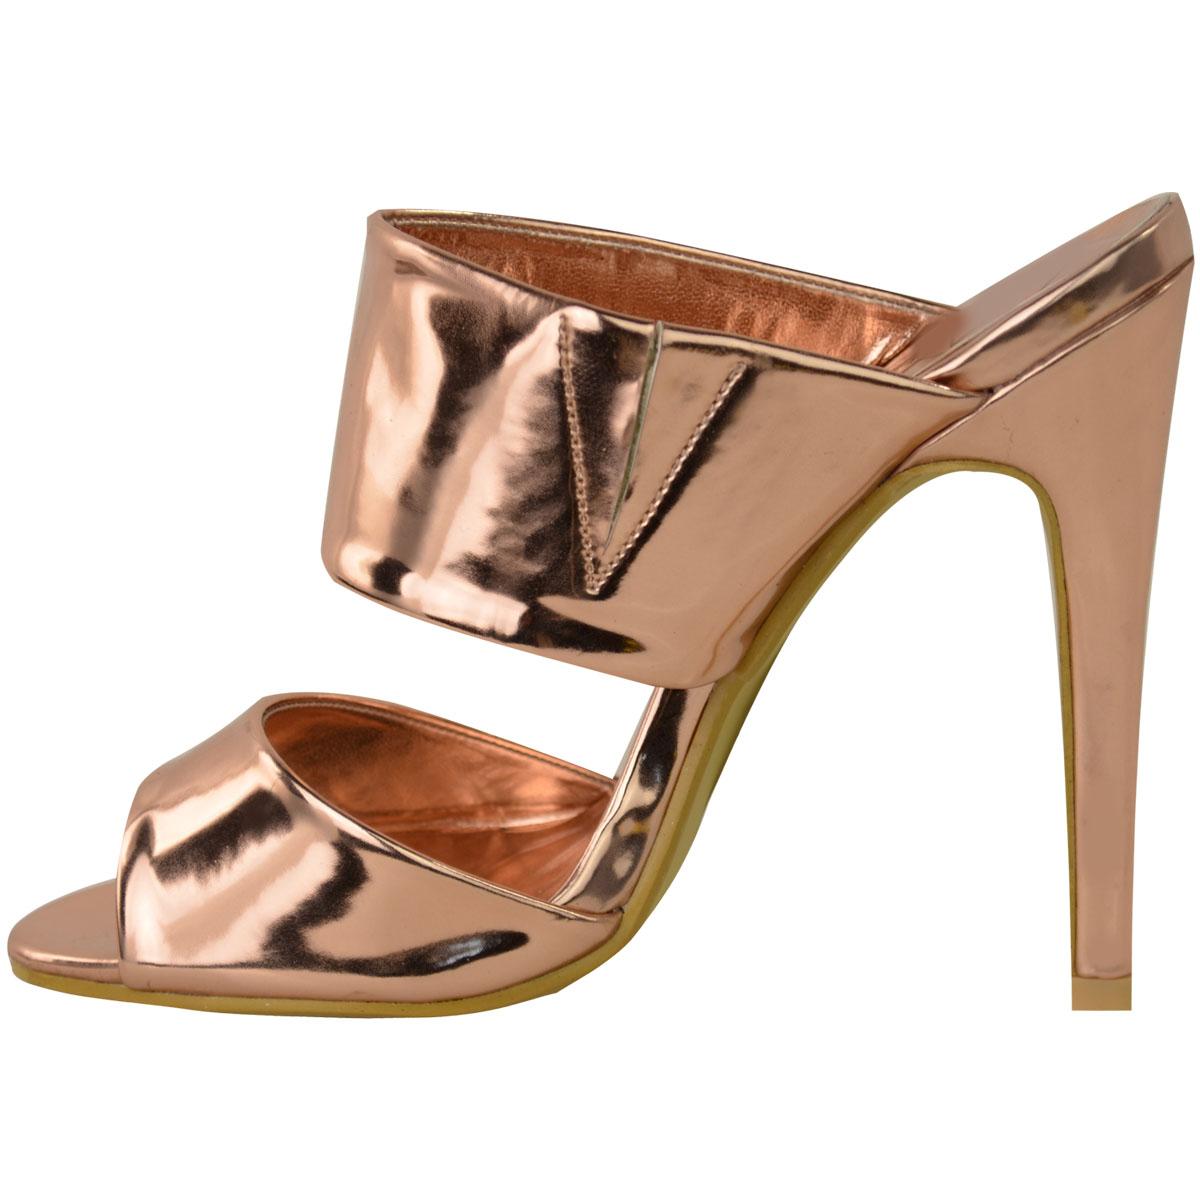 Womens sandals ebay - Ladies Womens High Heel Stiletto Backless Peep Toe